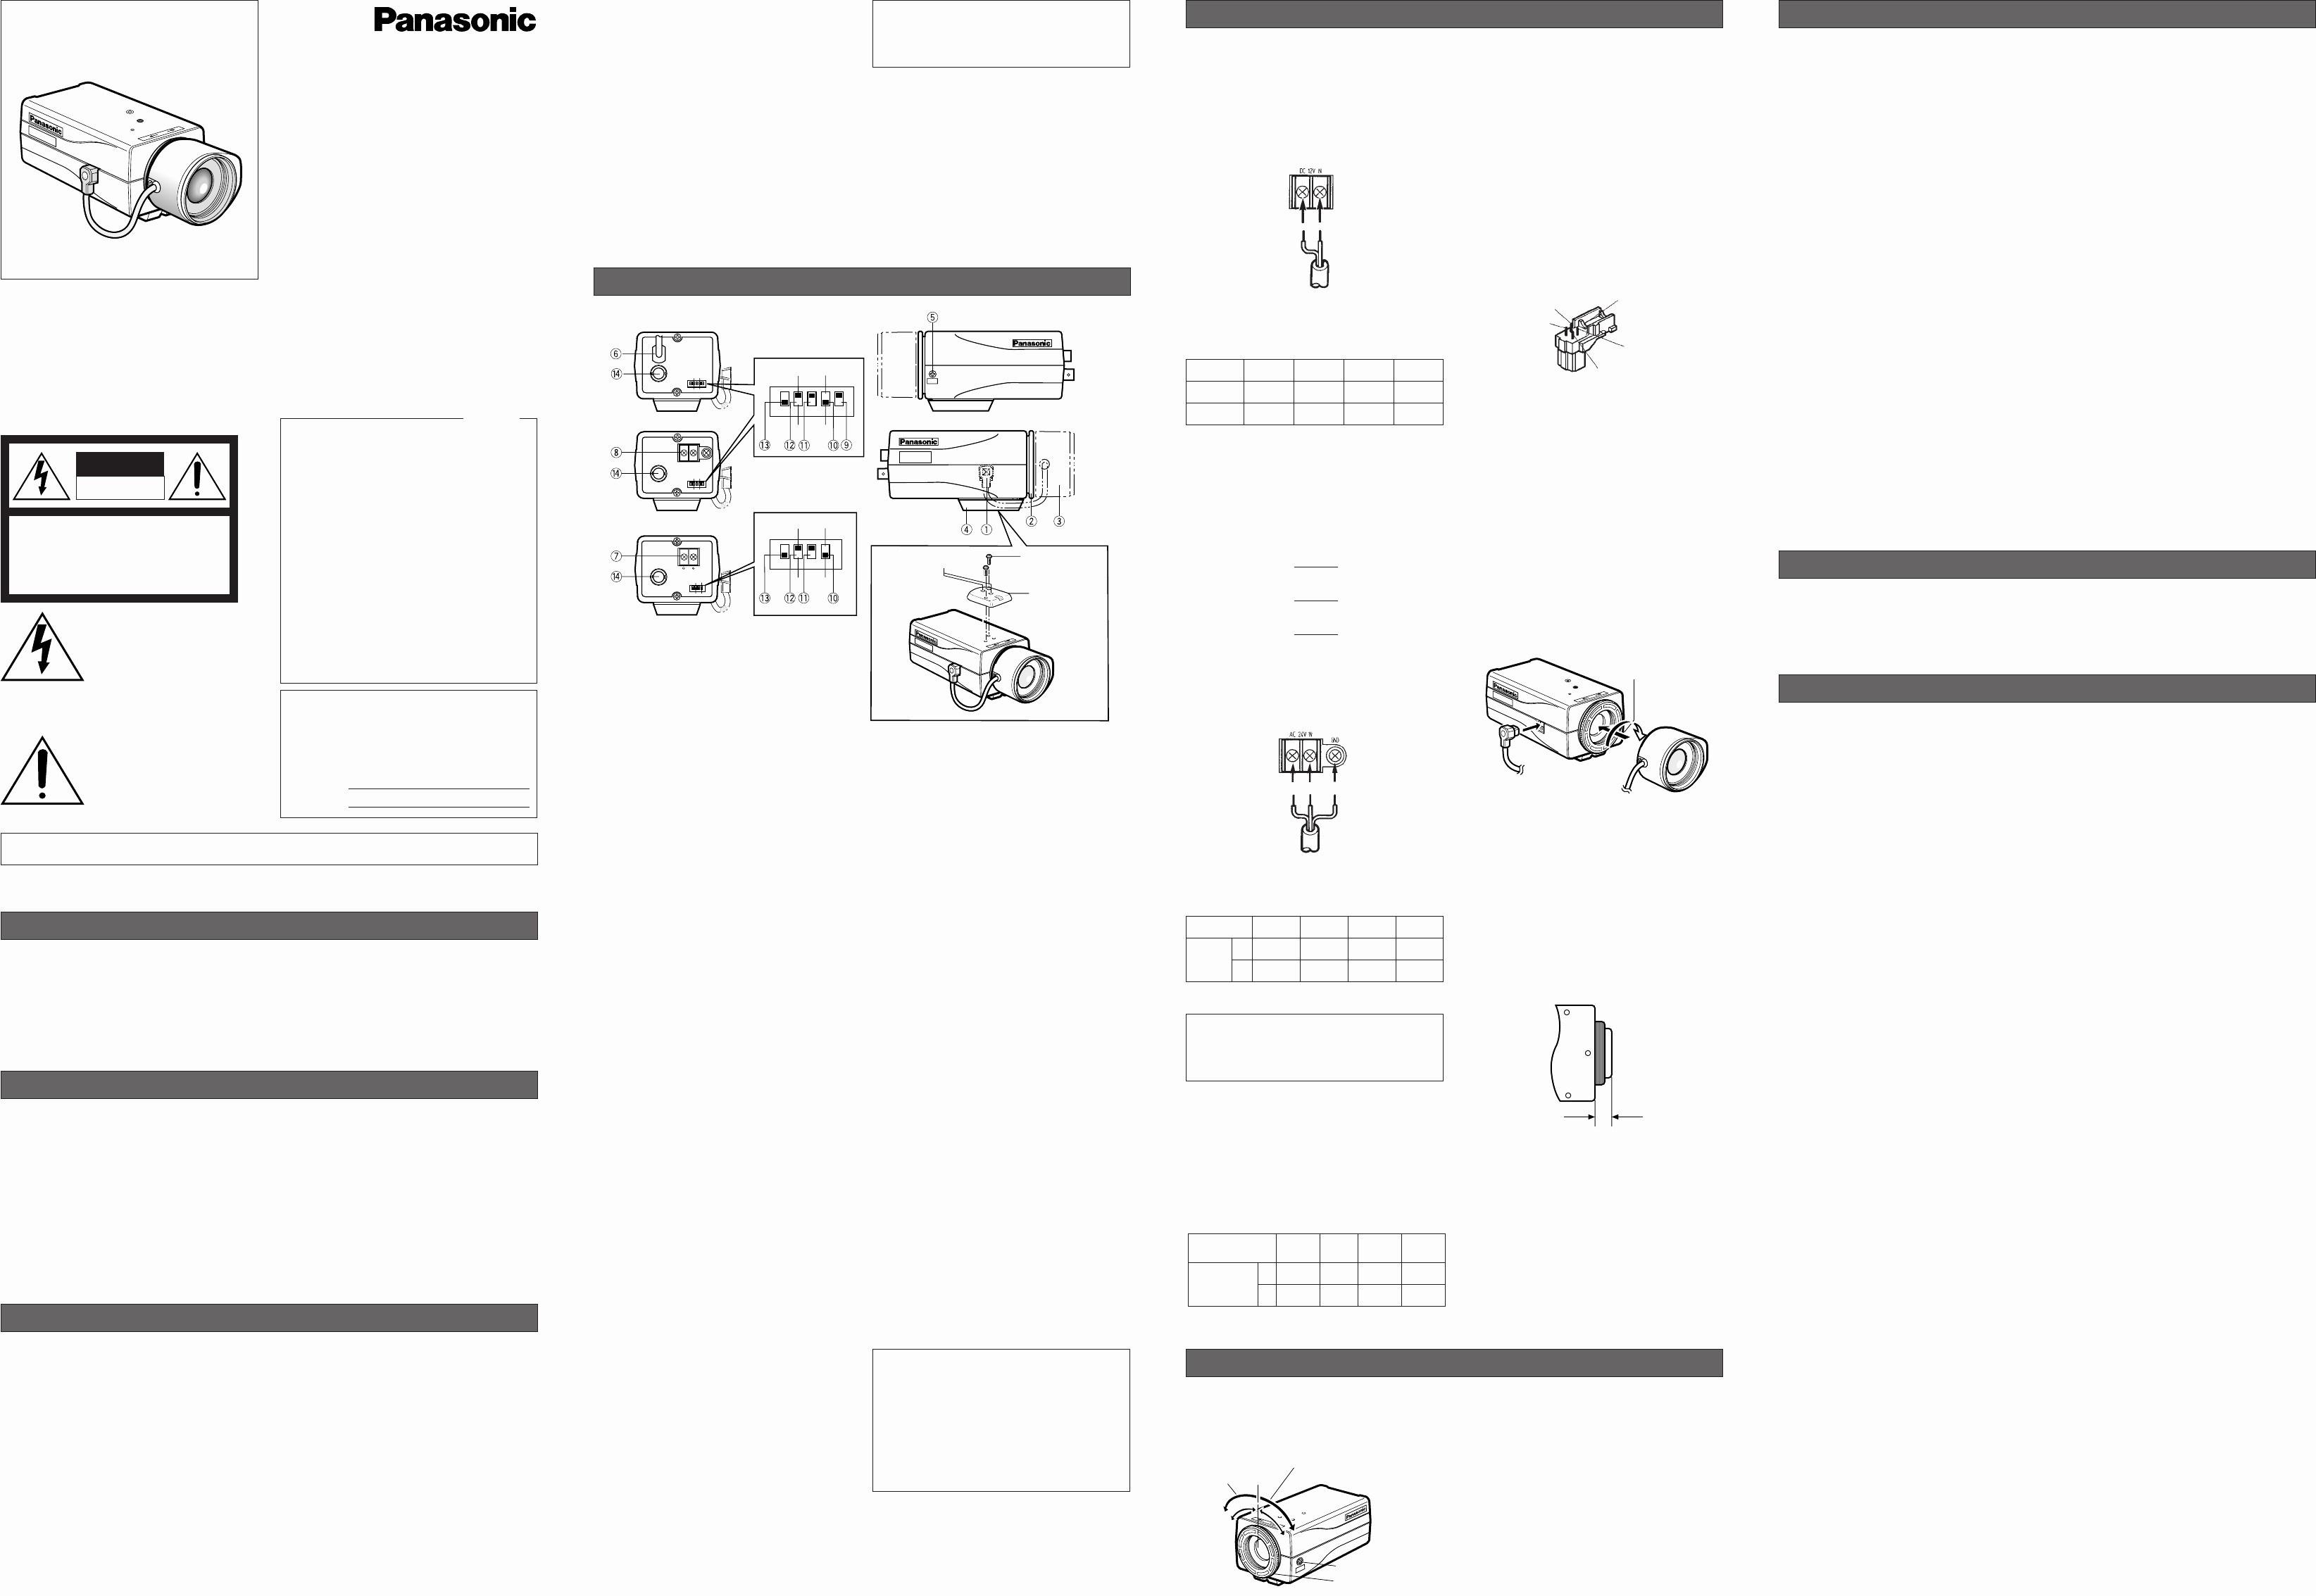 47546 Security Camera Wire Diagram | Manual E-Books - Security Camera Wiring Diagram